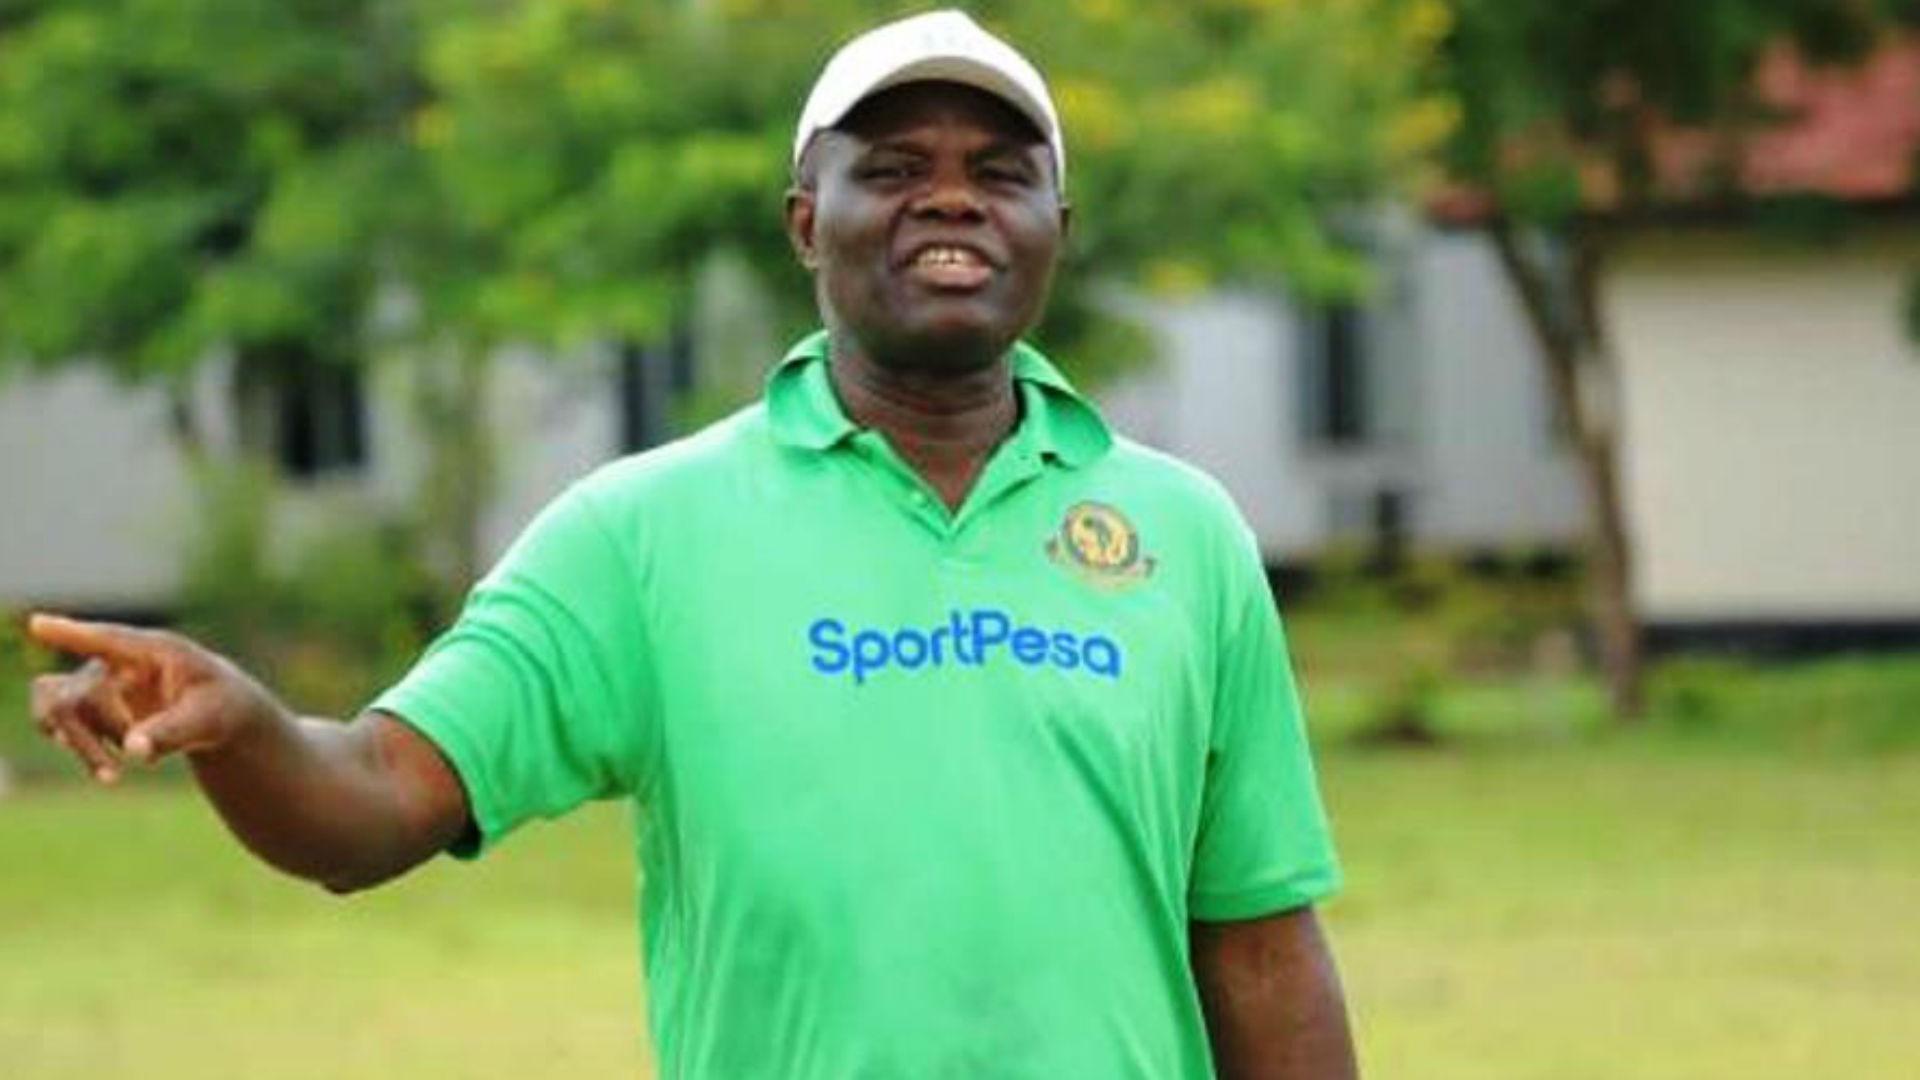 Zahera to blame for poor transfers and management at Yanga SC - Mwalusako